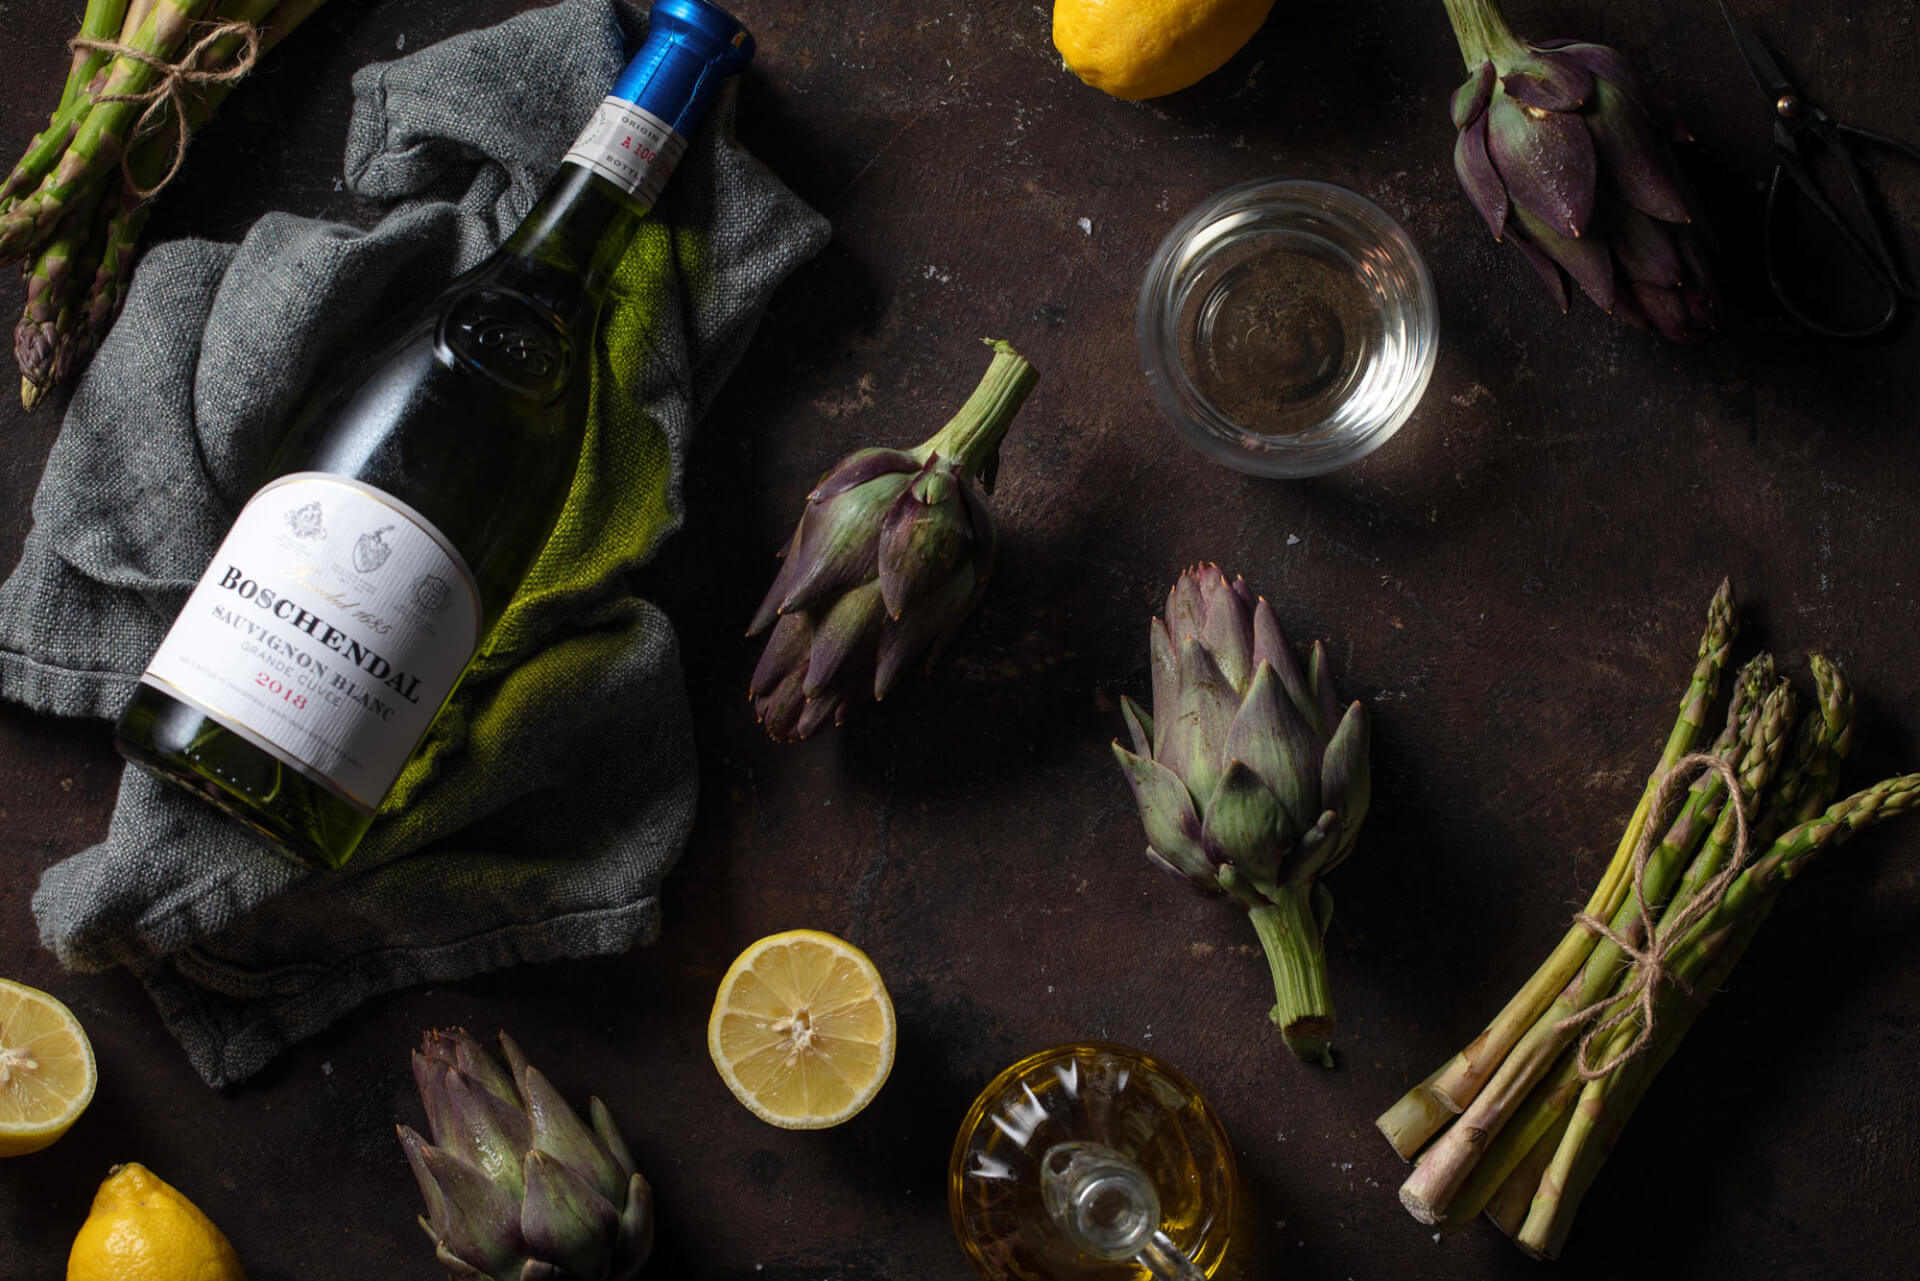 Boschendal 1685 Sauvignon Blanc styled fresh greens